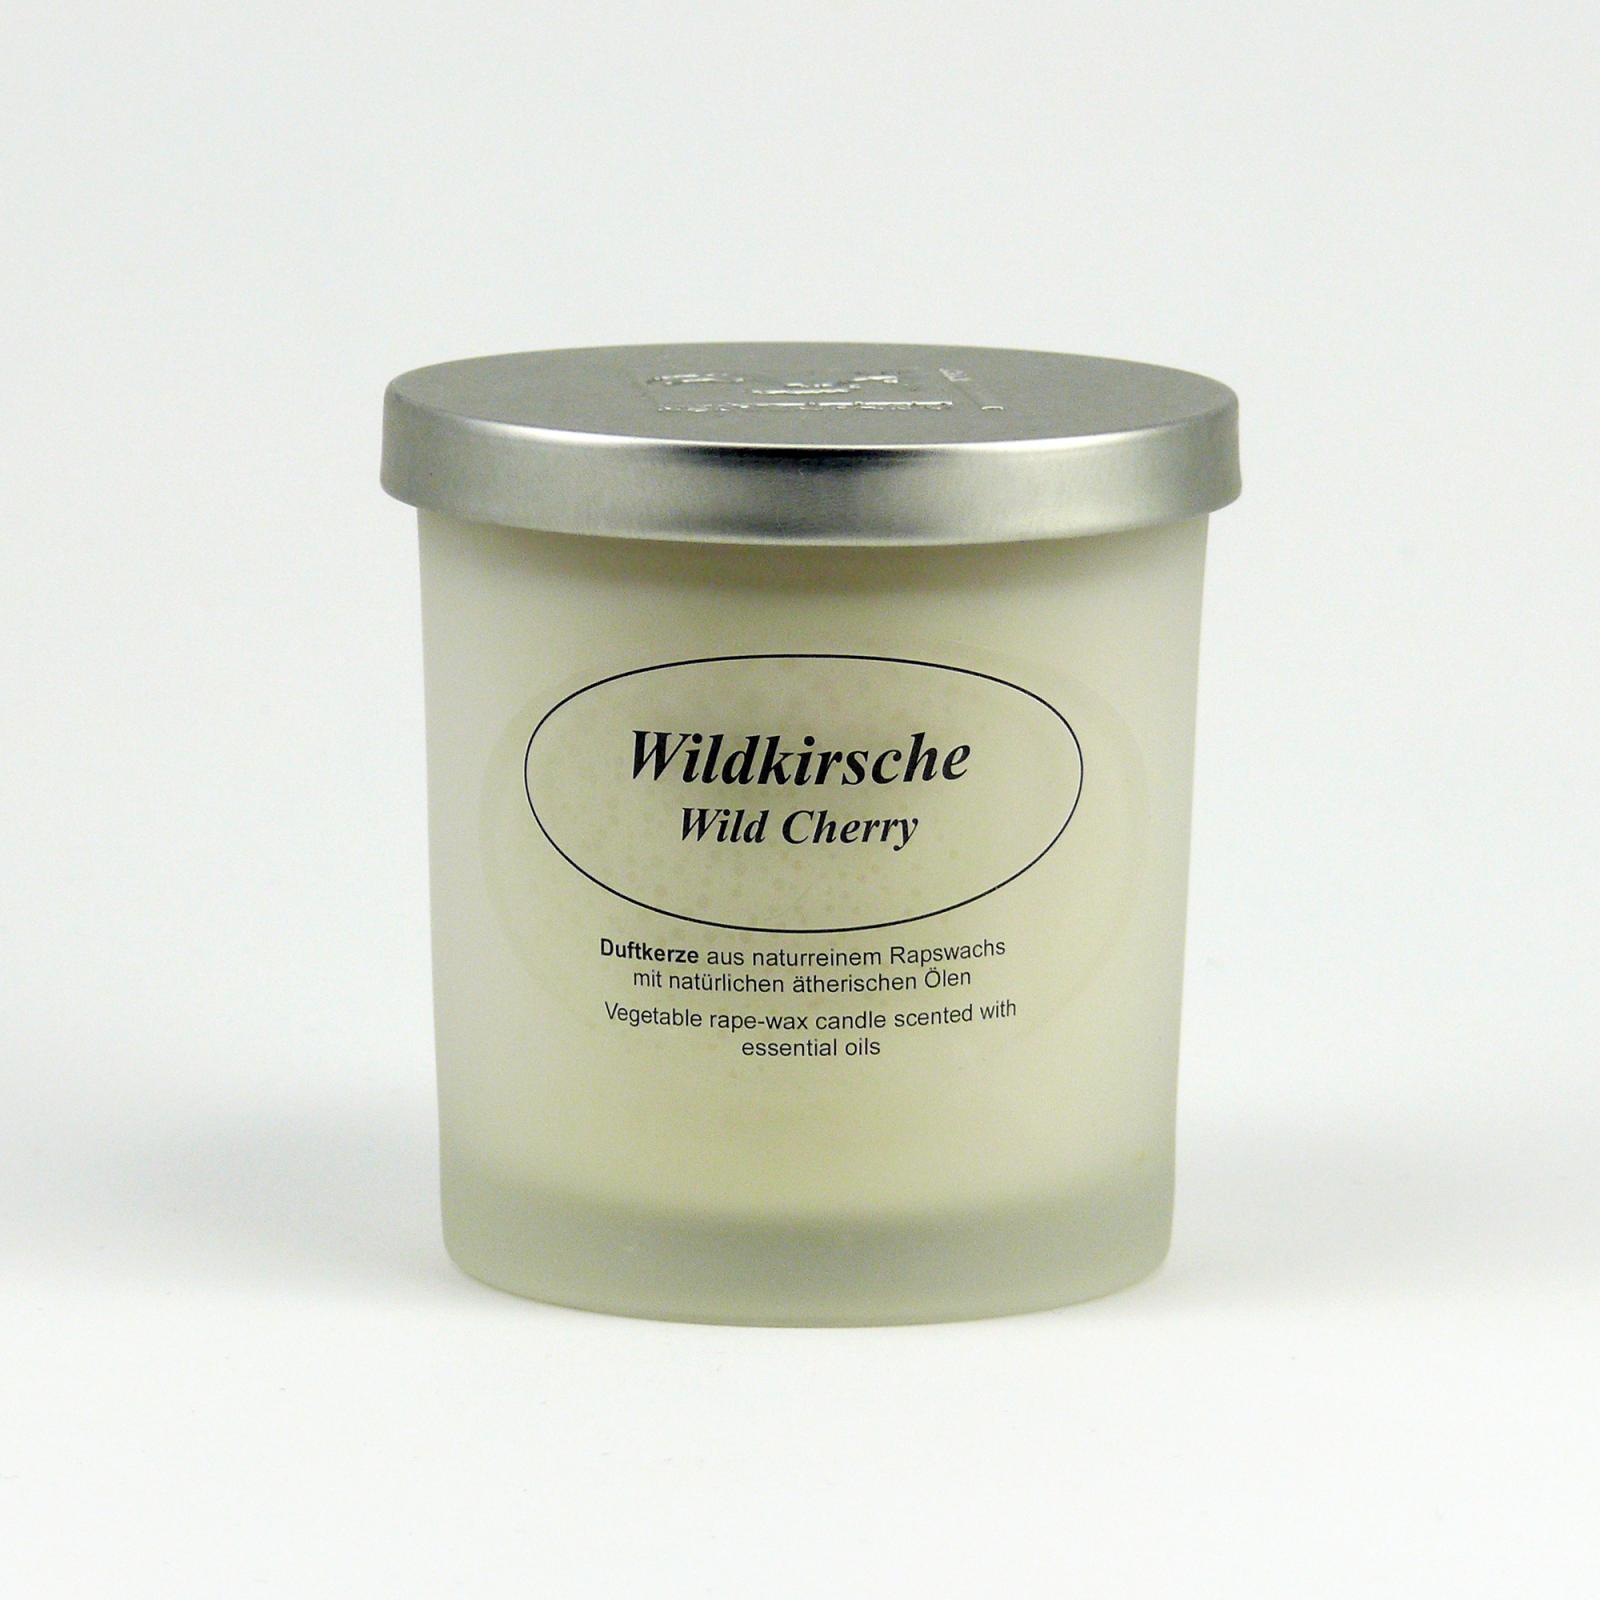 Kerzenfarm Přírodní svíčka Wild Cherry, mléčné sklo 8 cm